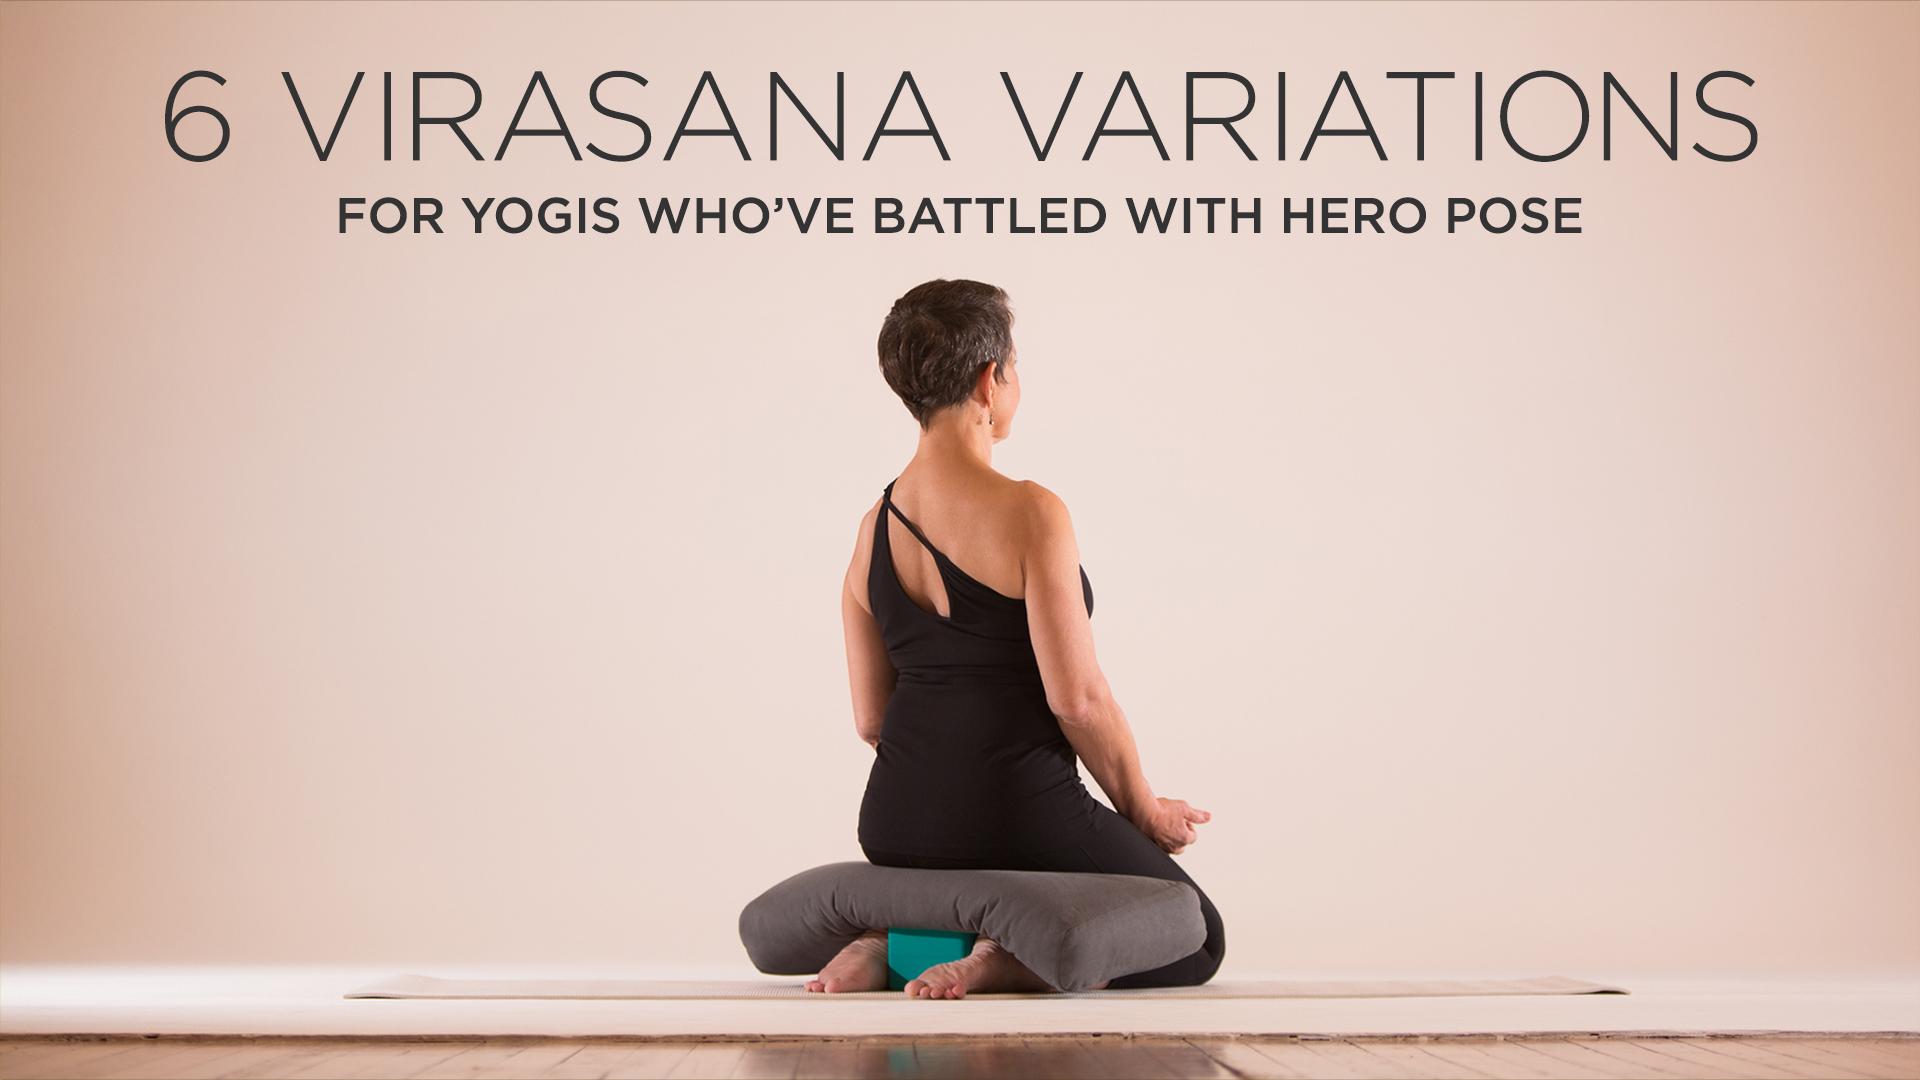 6 Virasana Variations for Yogis Who've Battled With Hero Pose